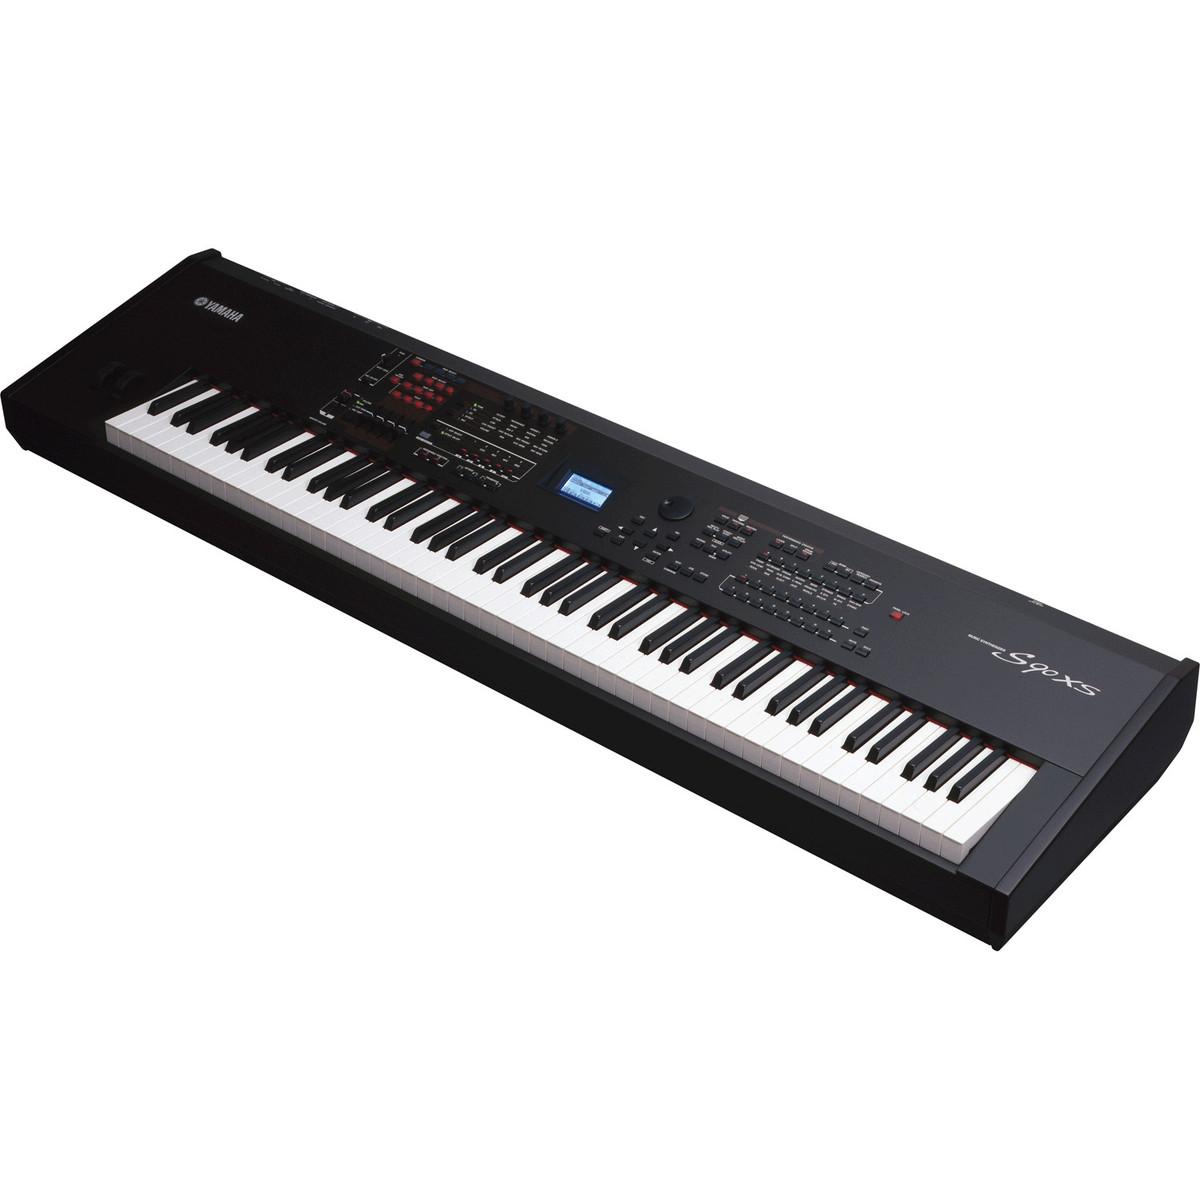 Sonderangebot yamaha s90 xs keyboard synthesizer auf for Yamaha keyboard synthesizer